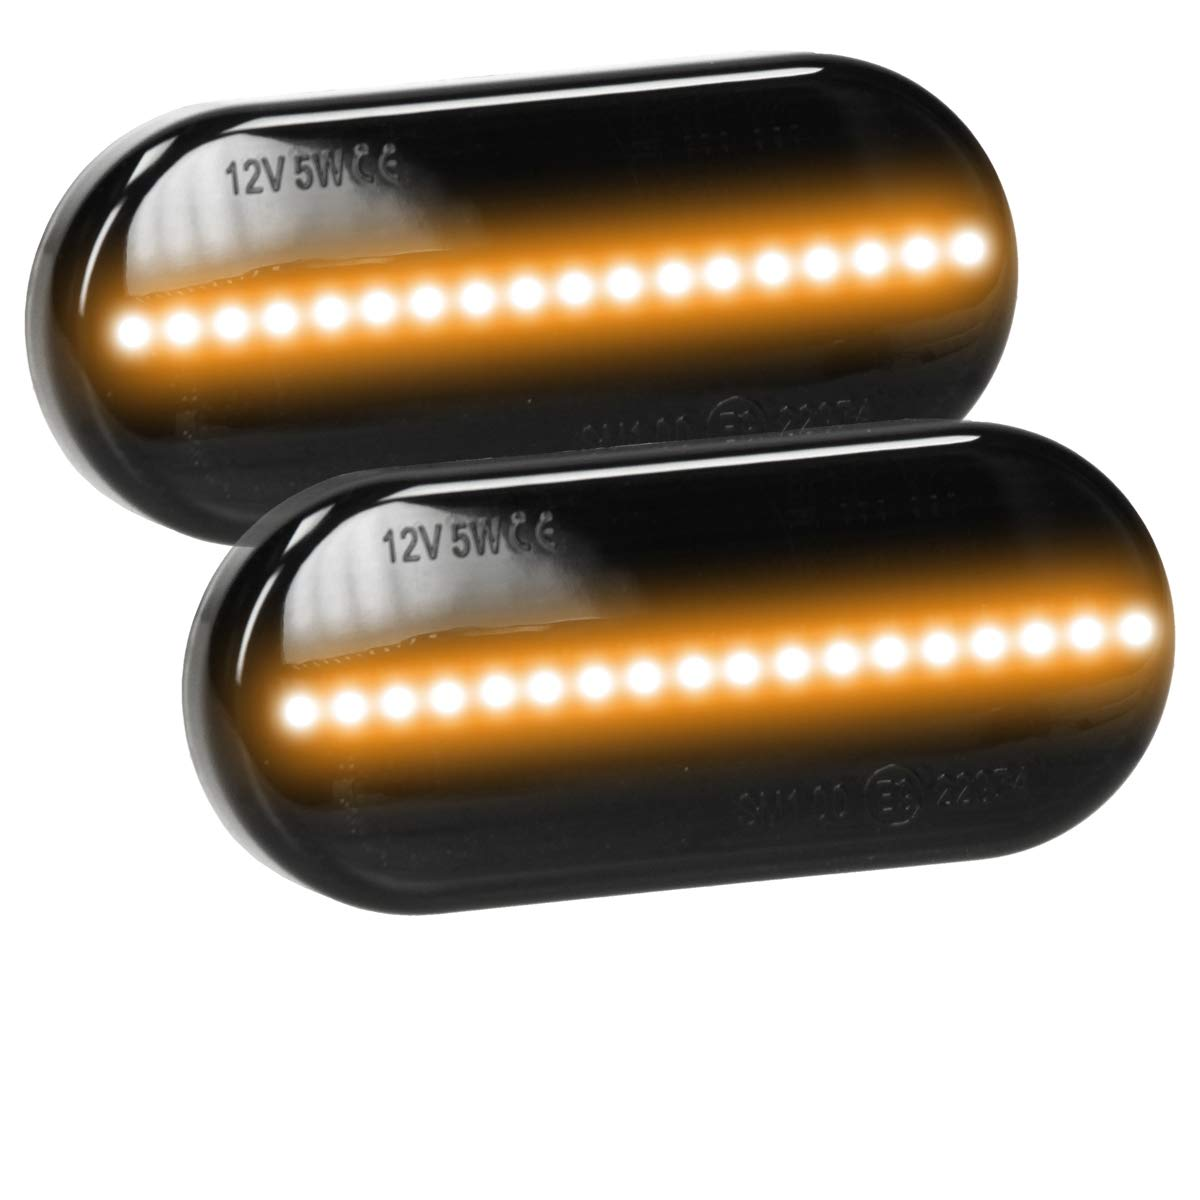 ECD Germany 2 pieces LED side indicator Smoke 12 V with E9 mark Plug /& Play technology black side indicator lamp Turn signal lamp Turn signal Turn indicator